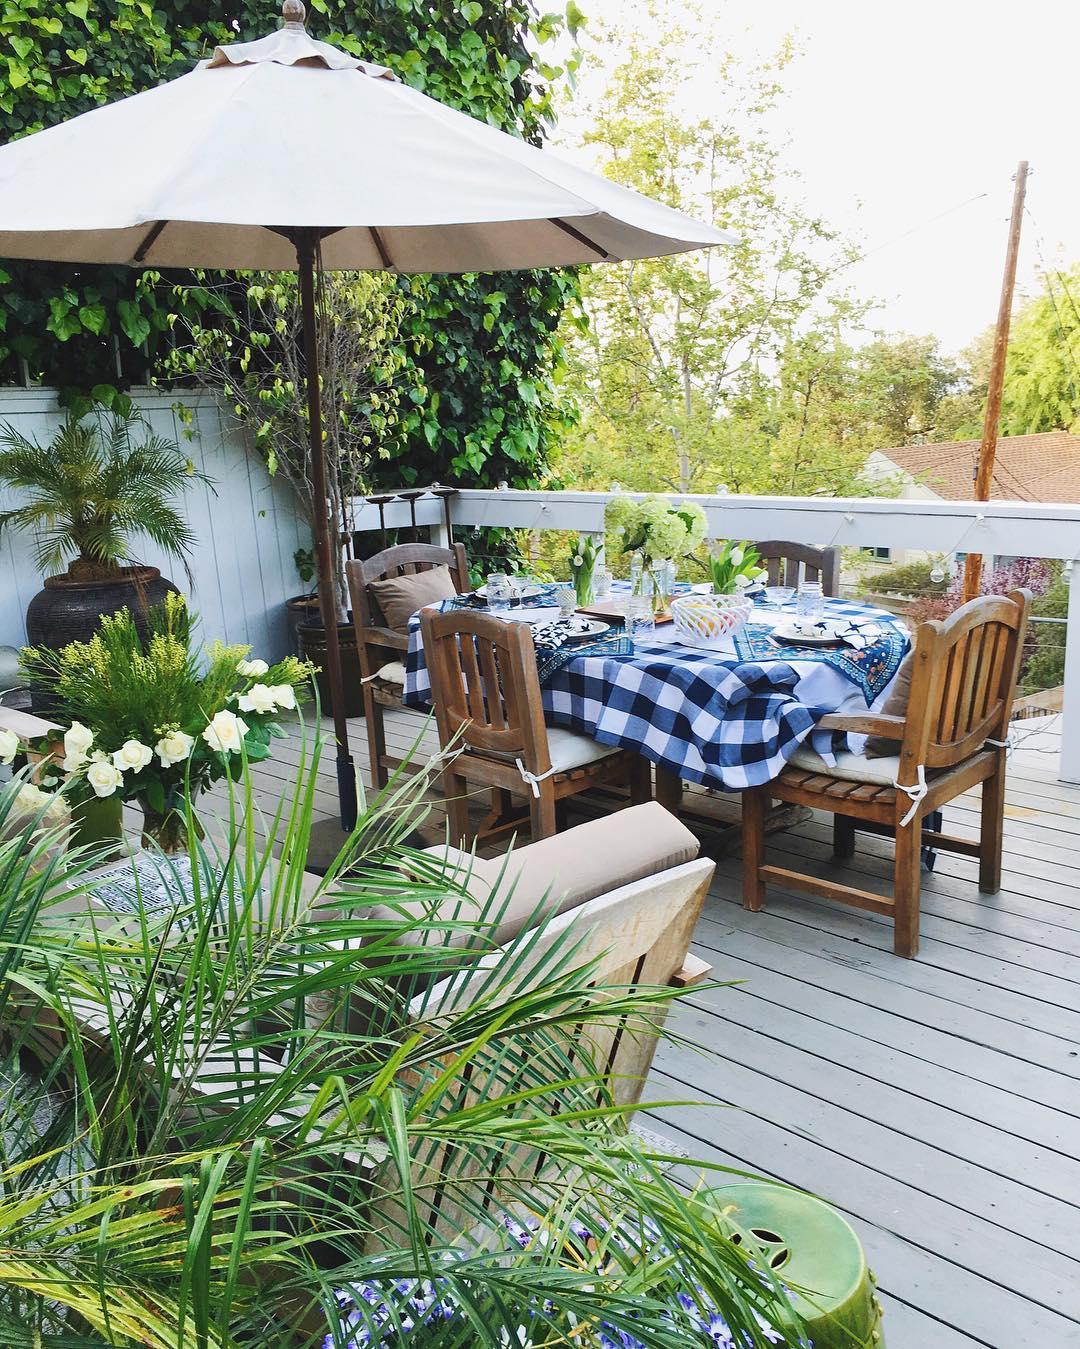 23+ Simple Patio Designs, Decorating Ideas | Design Trends ... on Cheap Backyard Patio Ideas id=26168